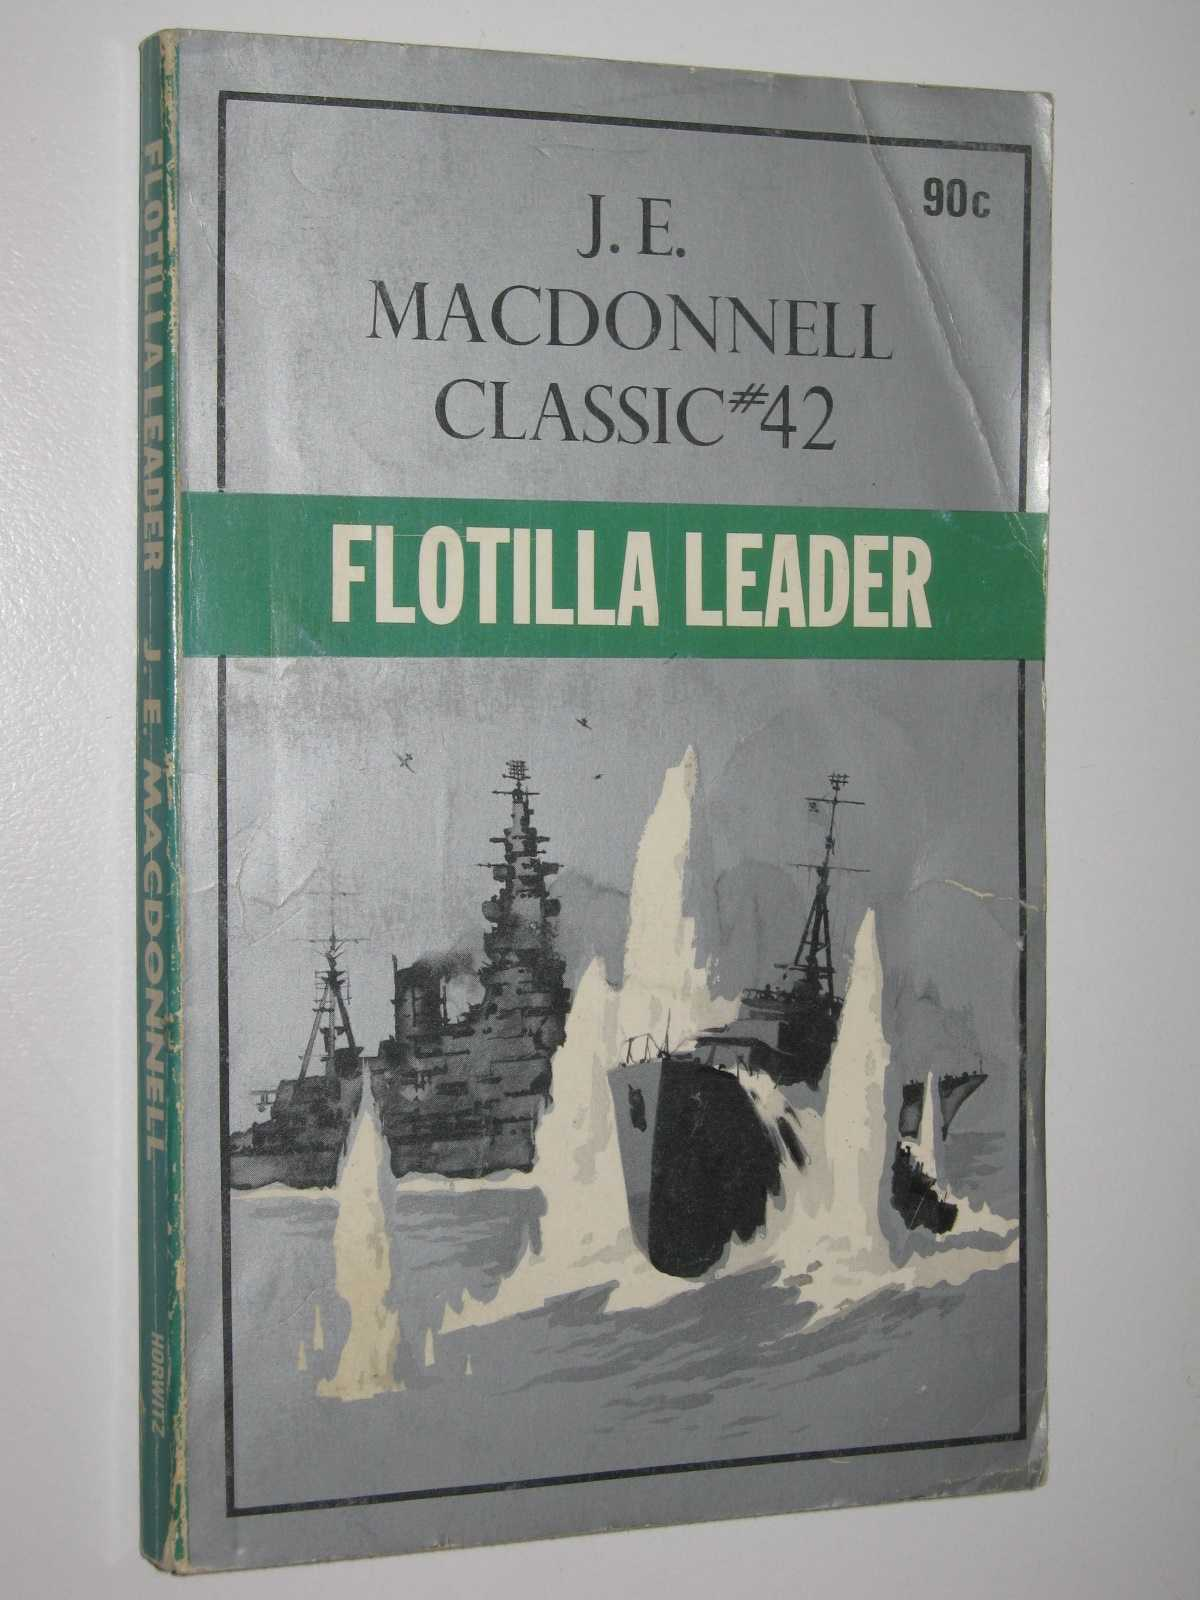 Flotilla Leader - Classic Series #42, Macdonnell, J. E.